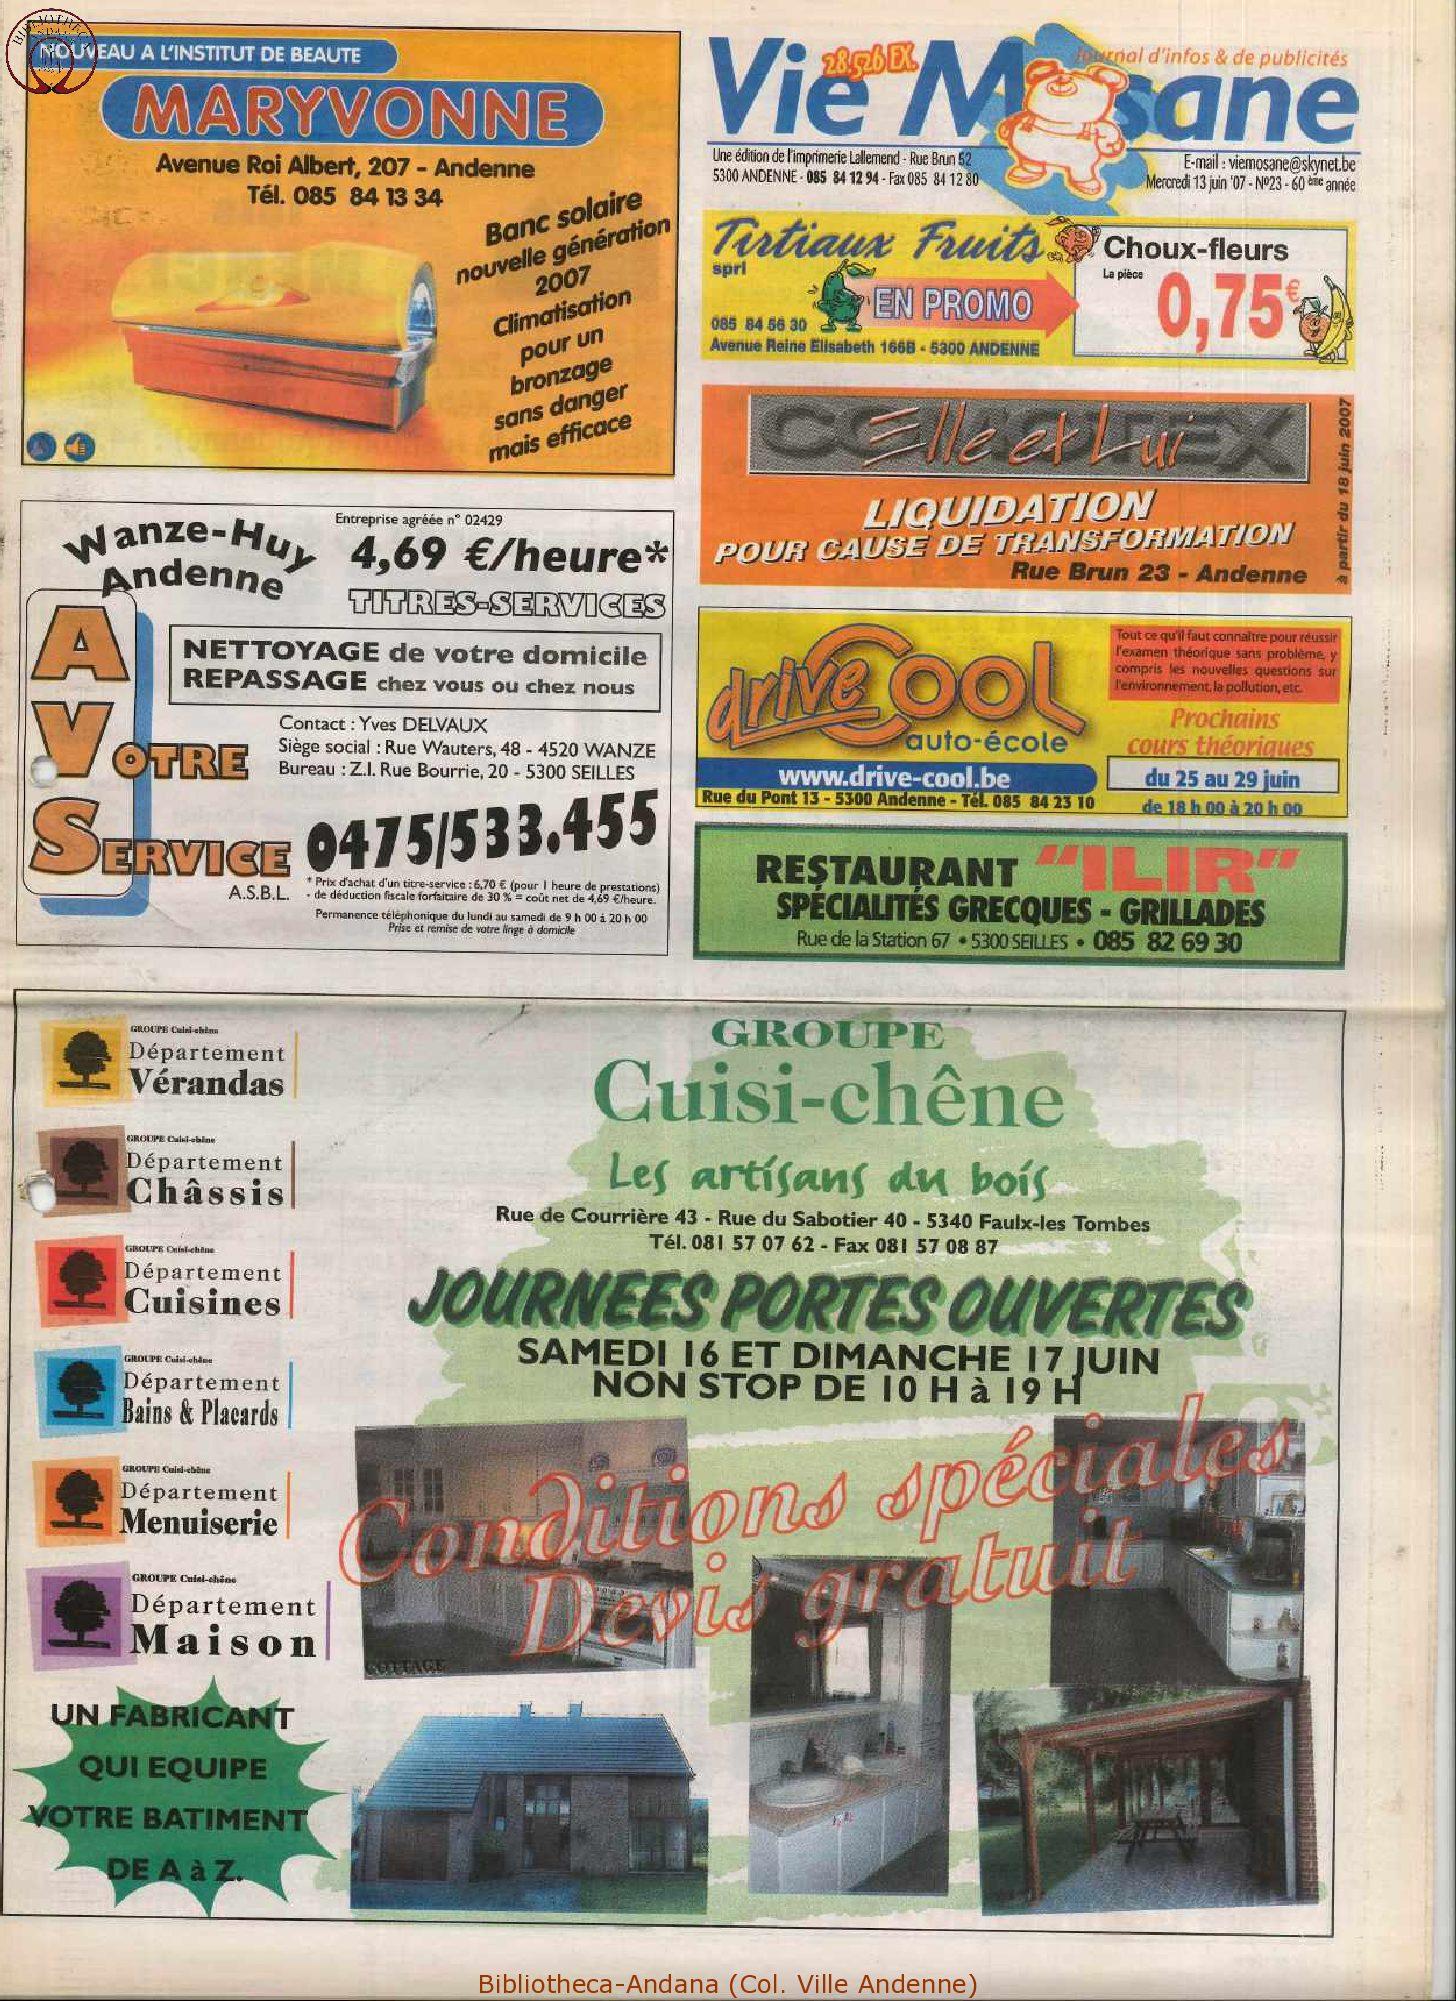 60e année - n°23 - 13 juin 2007